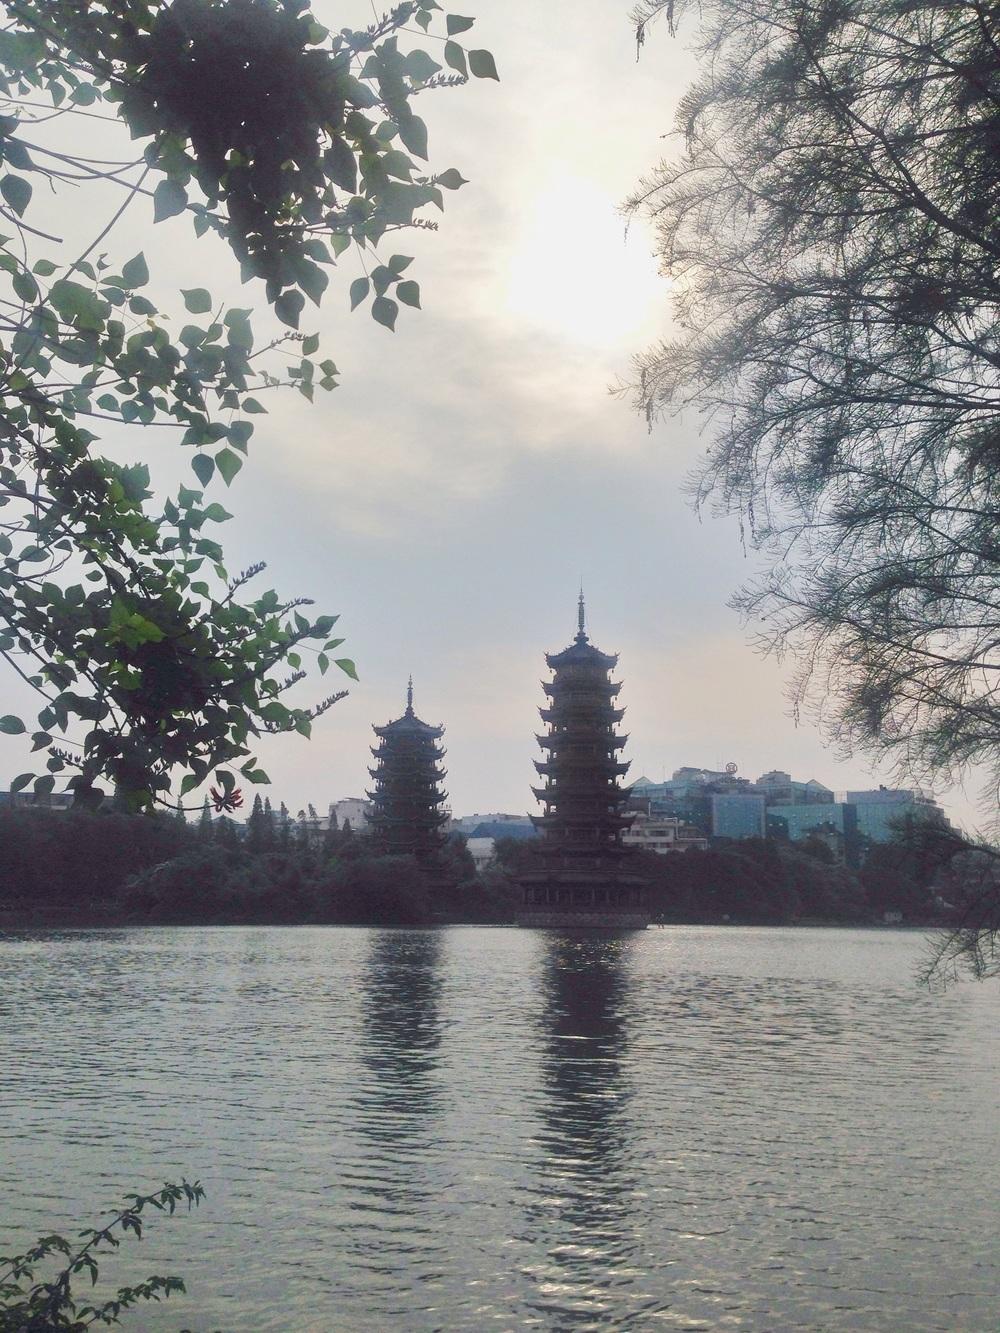 Sun and Moon Twin Pagodas.